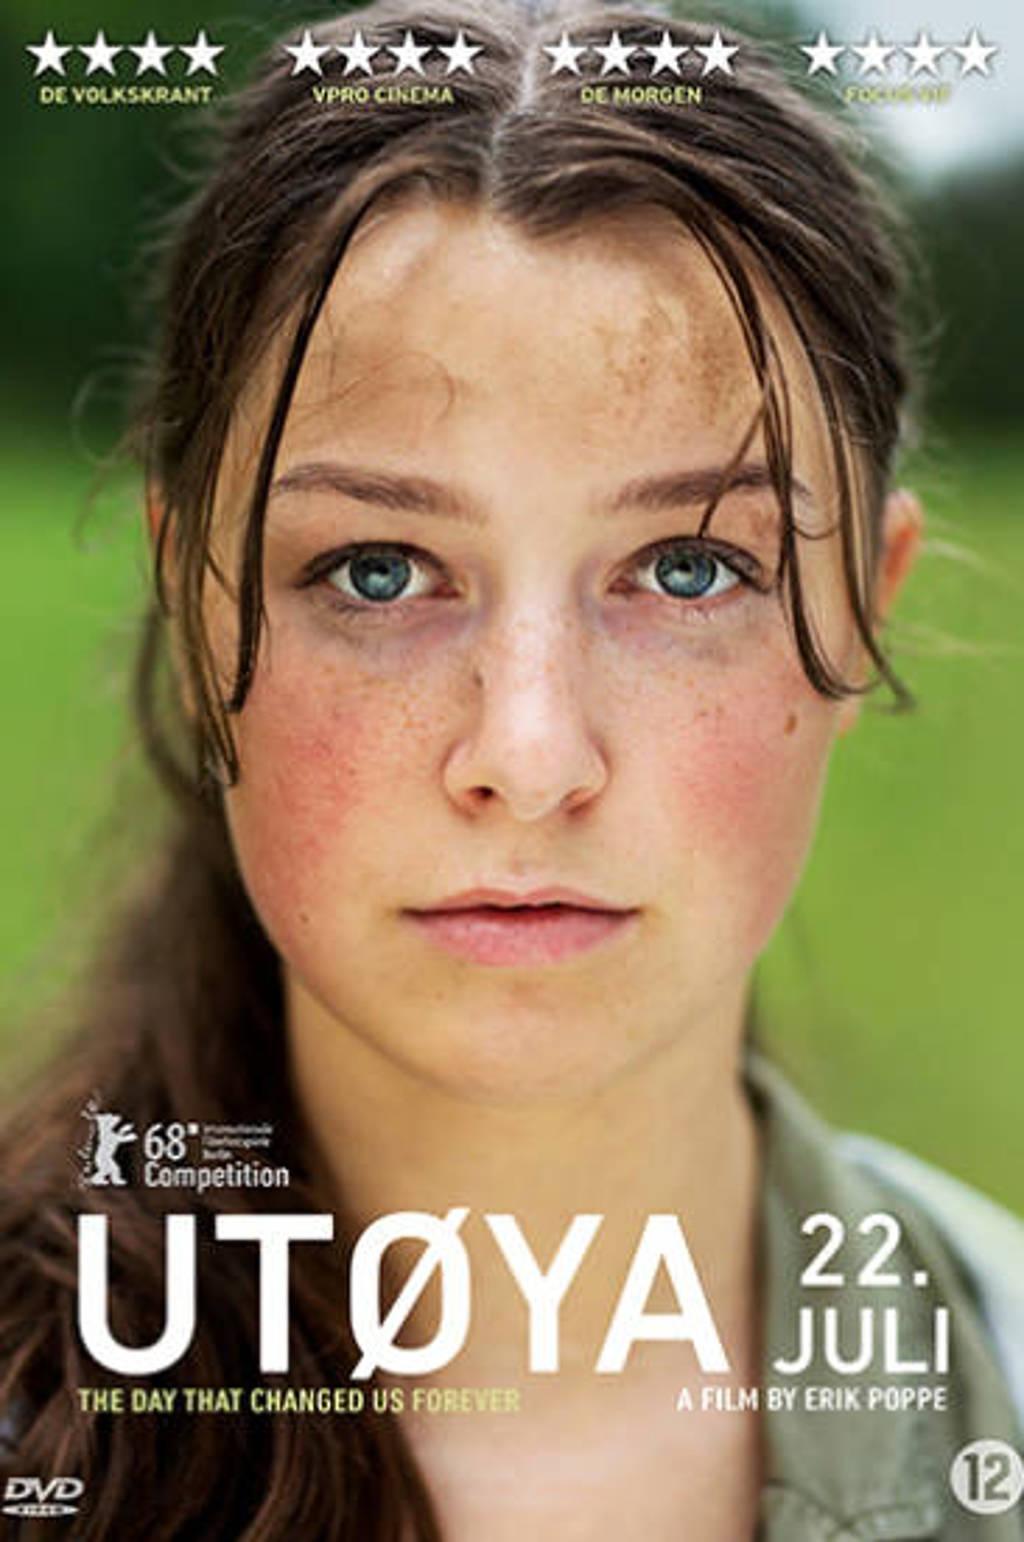 Utoya 22 july  (DVD)